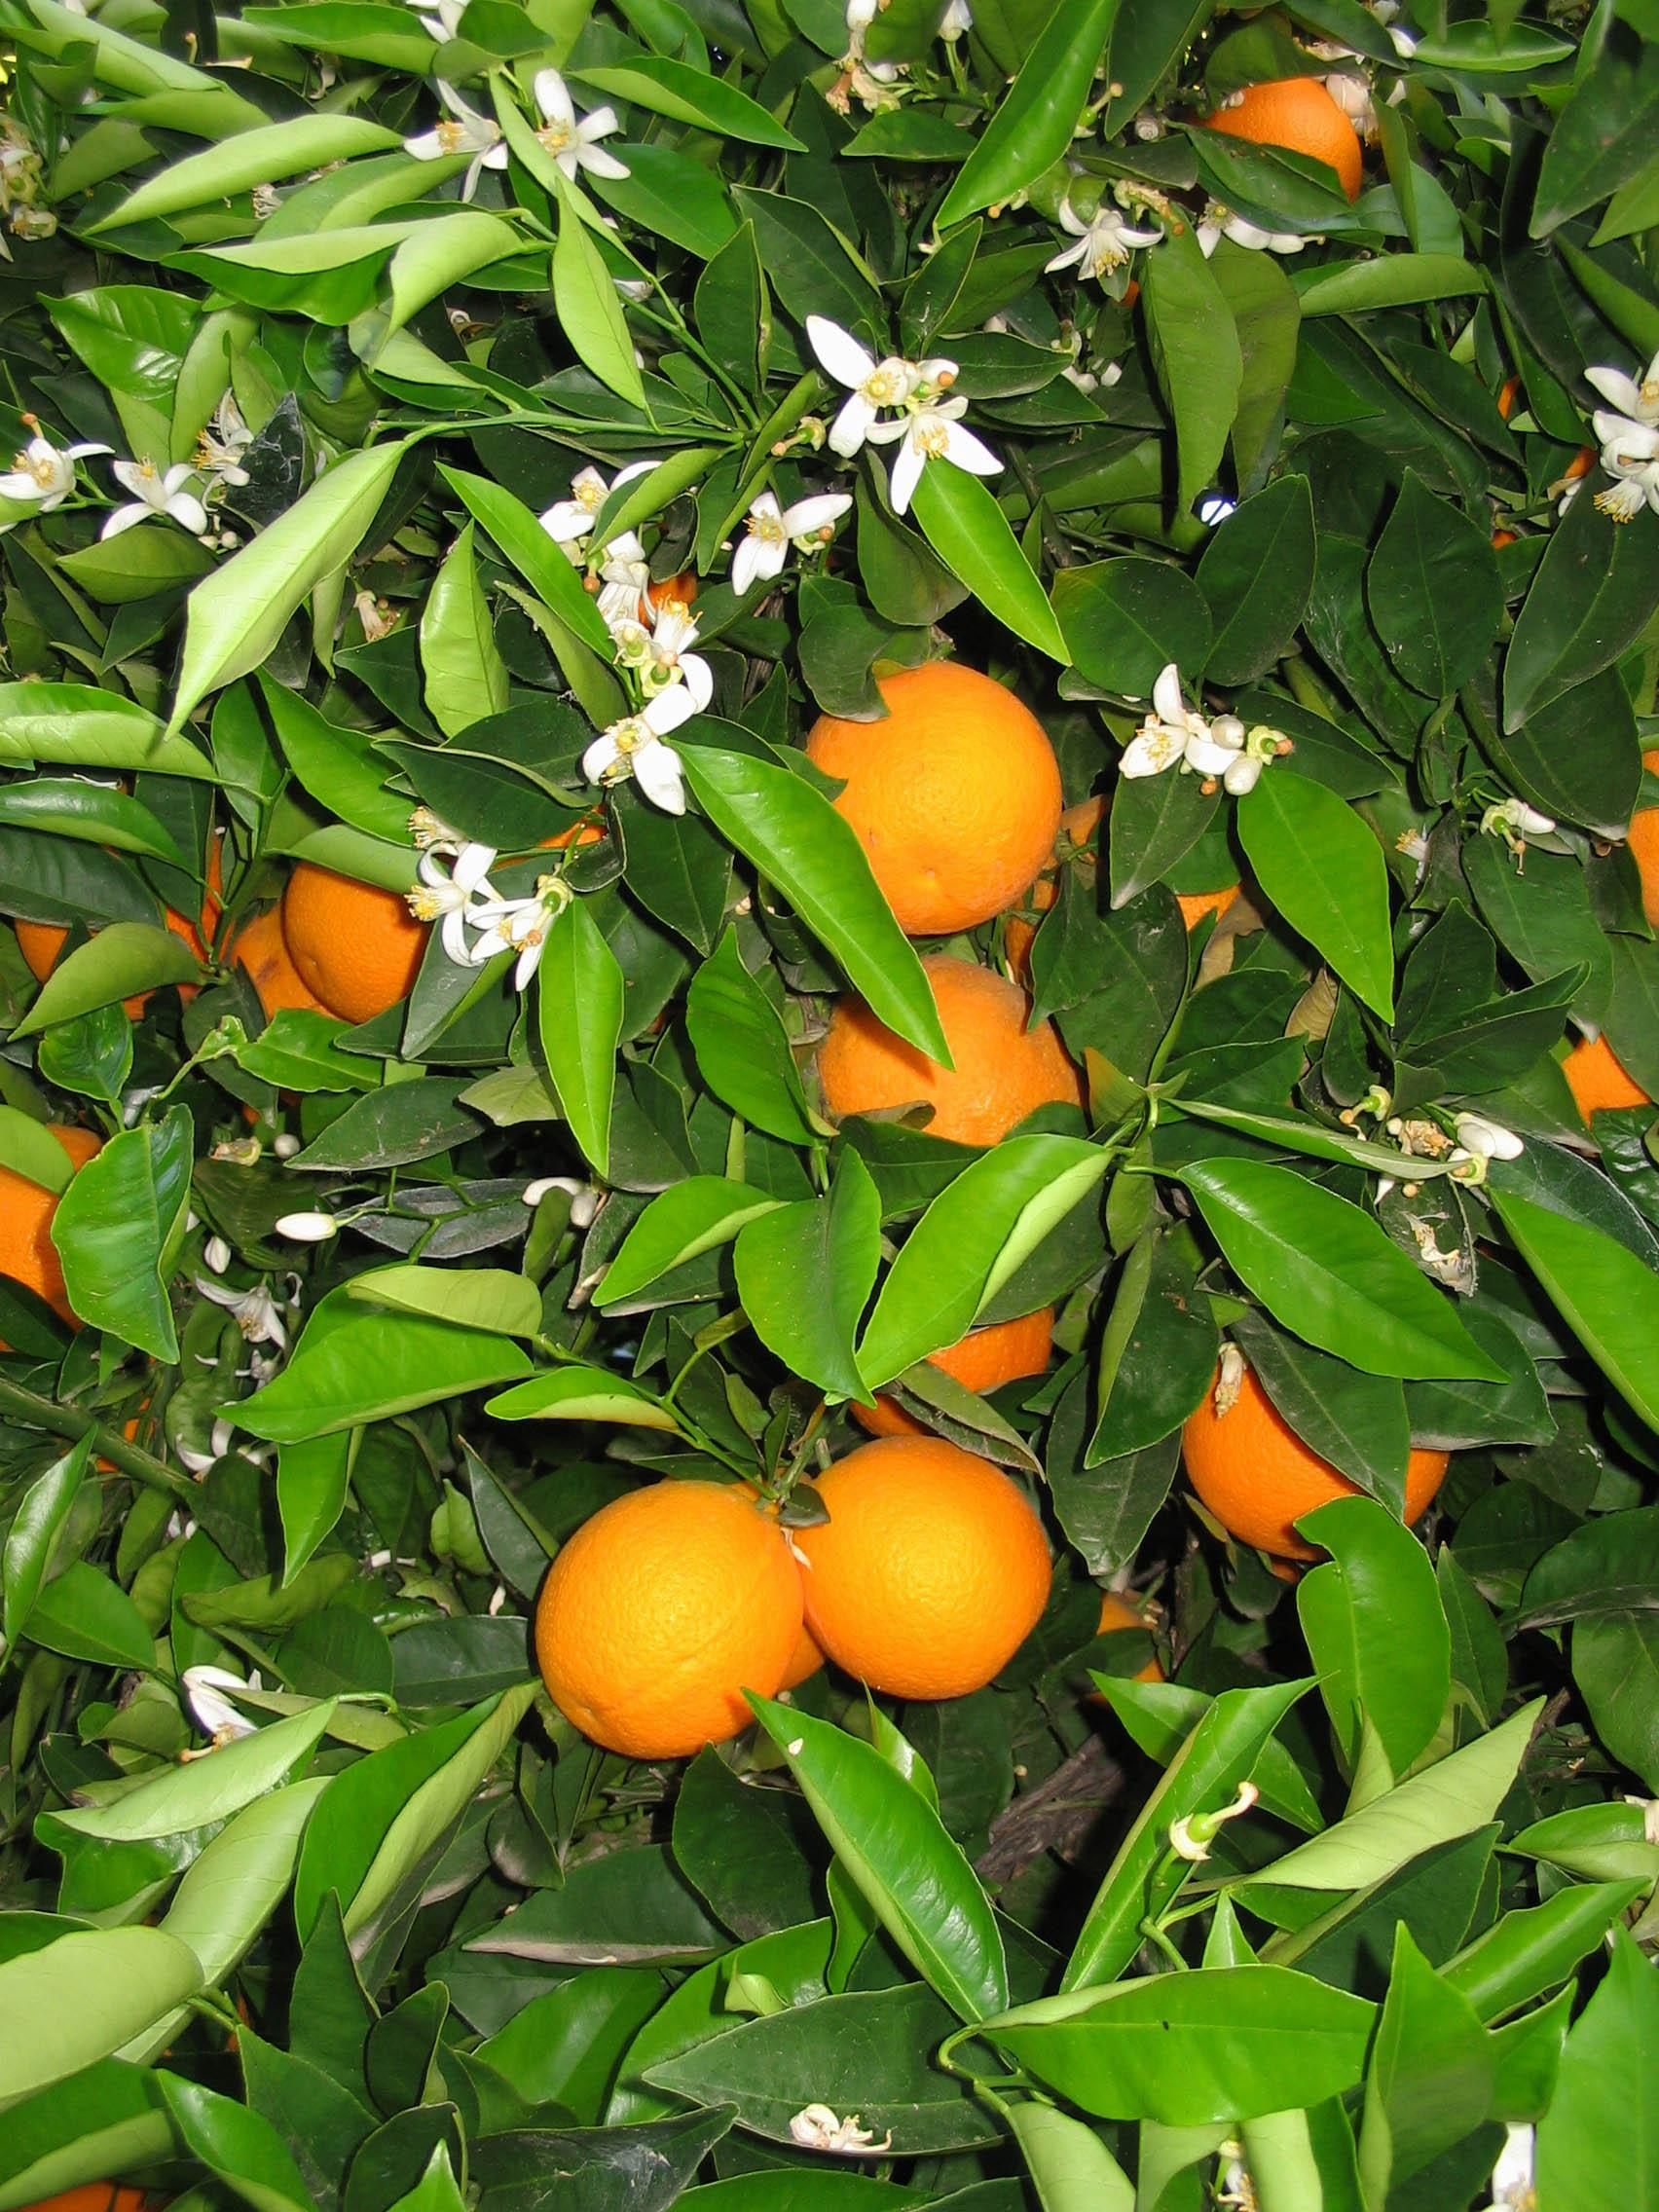 Call Guru Com >> Citrus sinensis 'Washington' - Sloat Garden Center